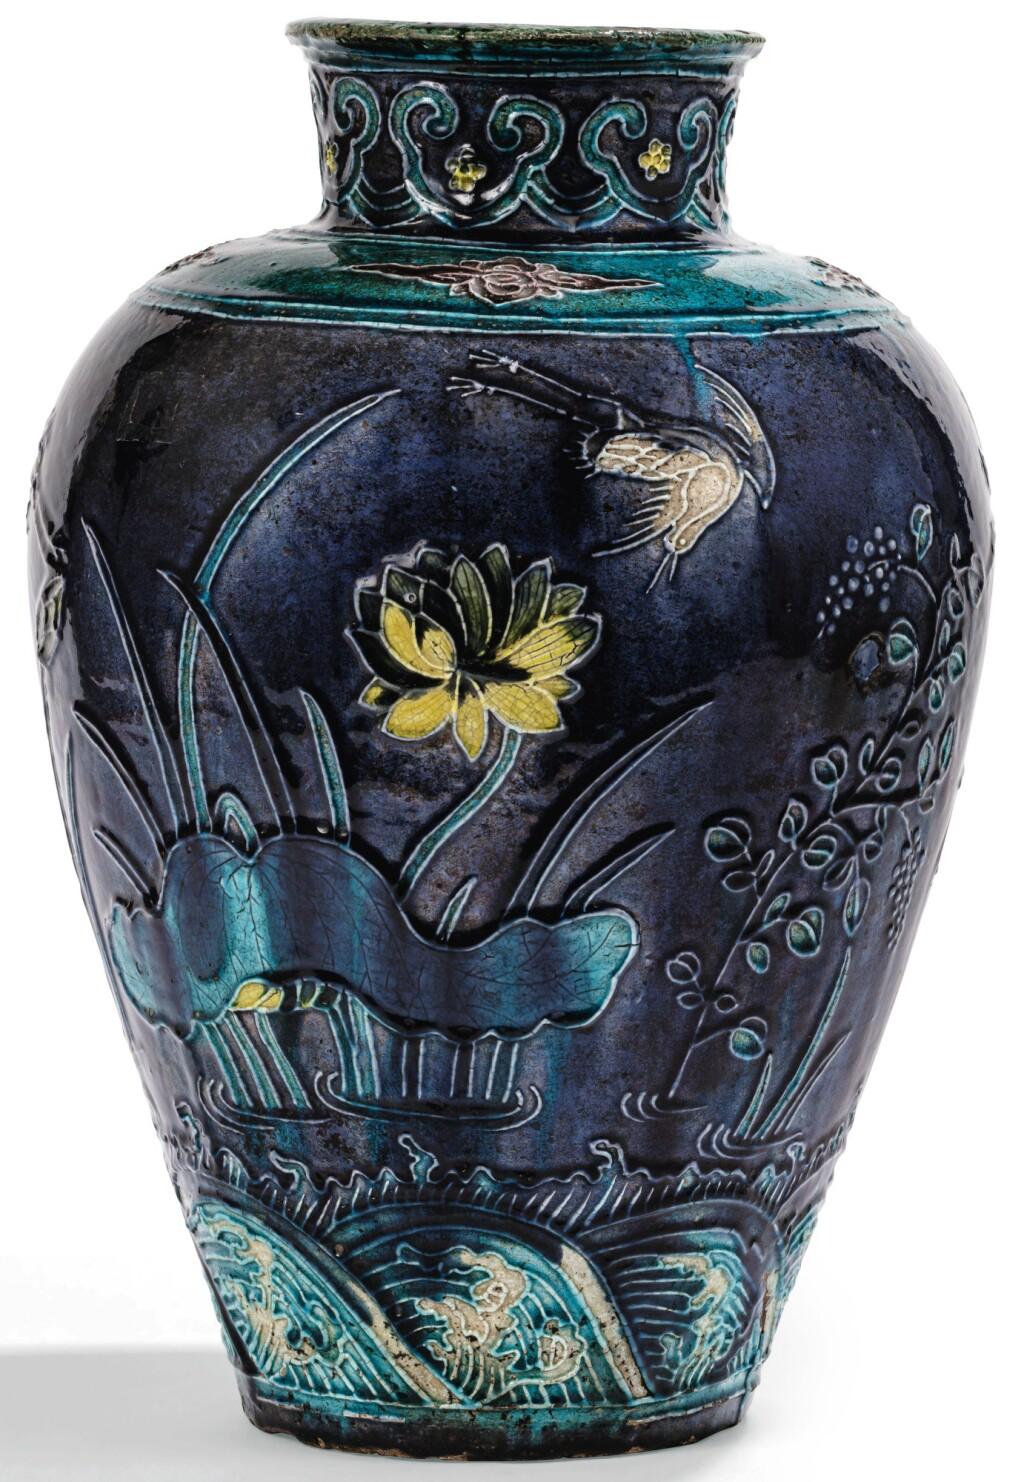 VASE BALUSTRE EN GRÈS FAHUA DYNASTIE MING | 明 琺華一路連科圖罐 | A Fahua baluster vase, Ming Dynasty